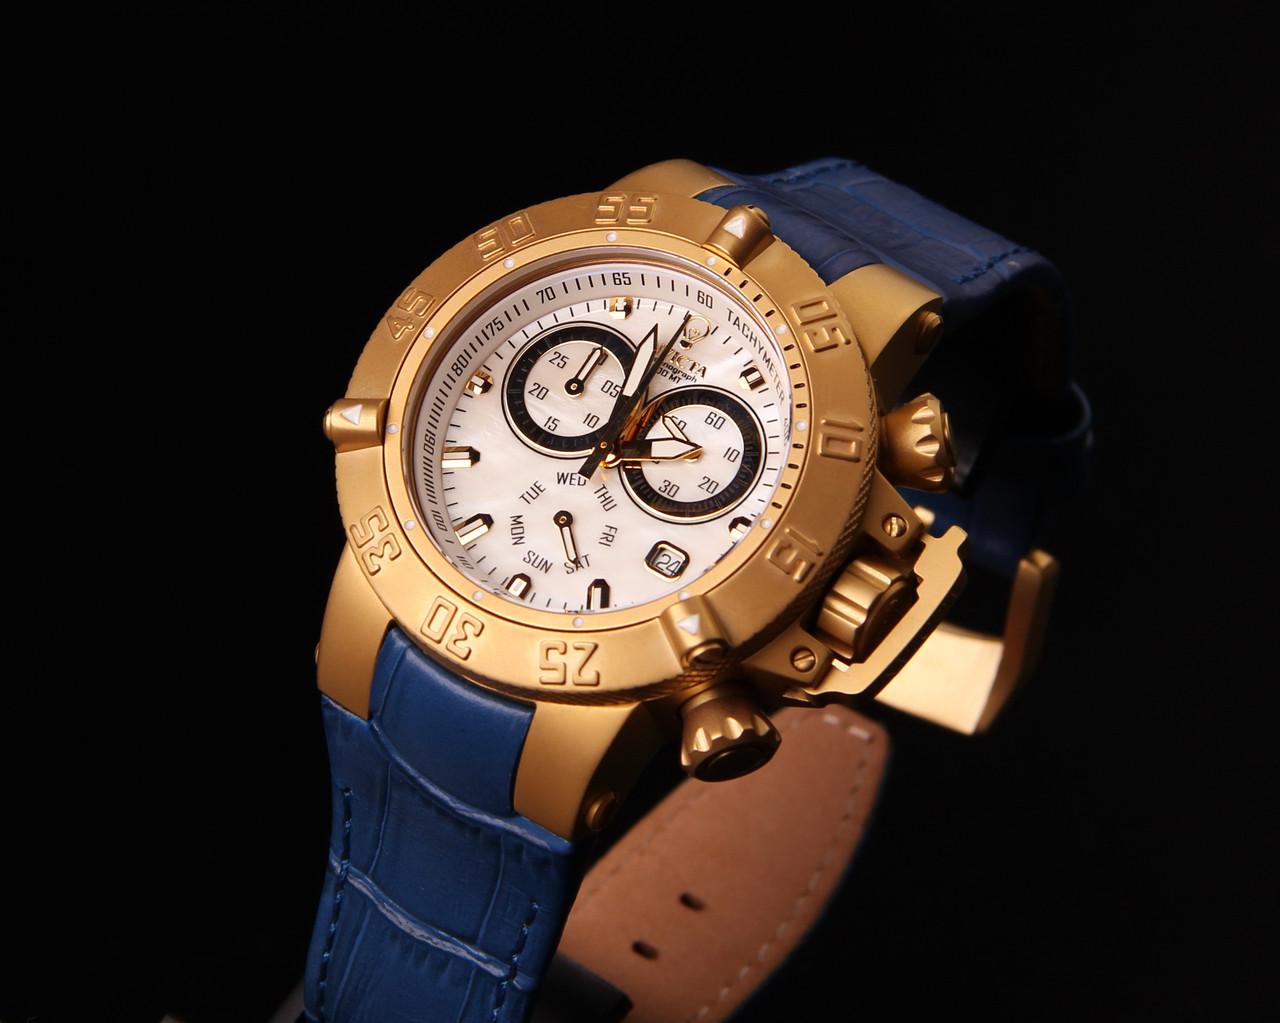 06c6d5e6 Женские часы Invicta 23173 Subaqua Noma III, цена 6 960 грн., купить ...